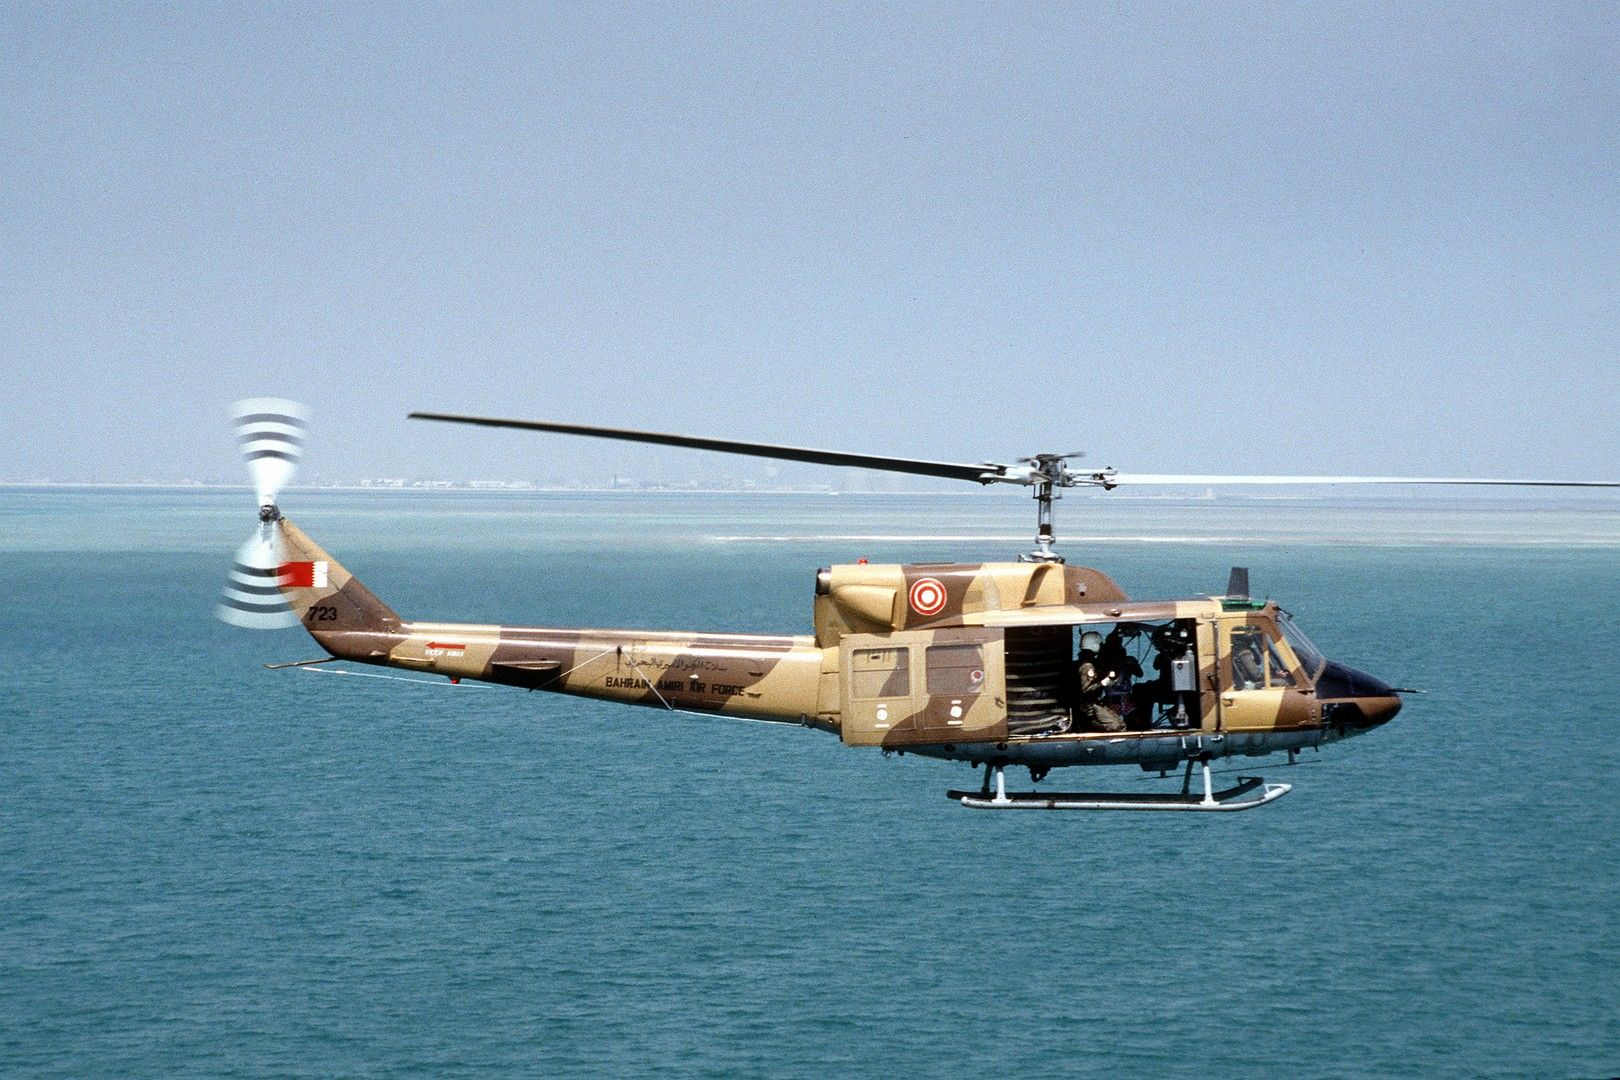 Обои AB-212, Agusta-Bell, транспортный вертолёт. Авиация foto 9